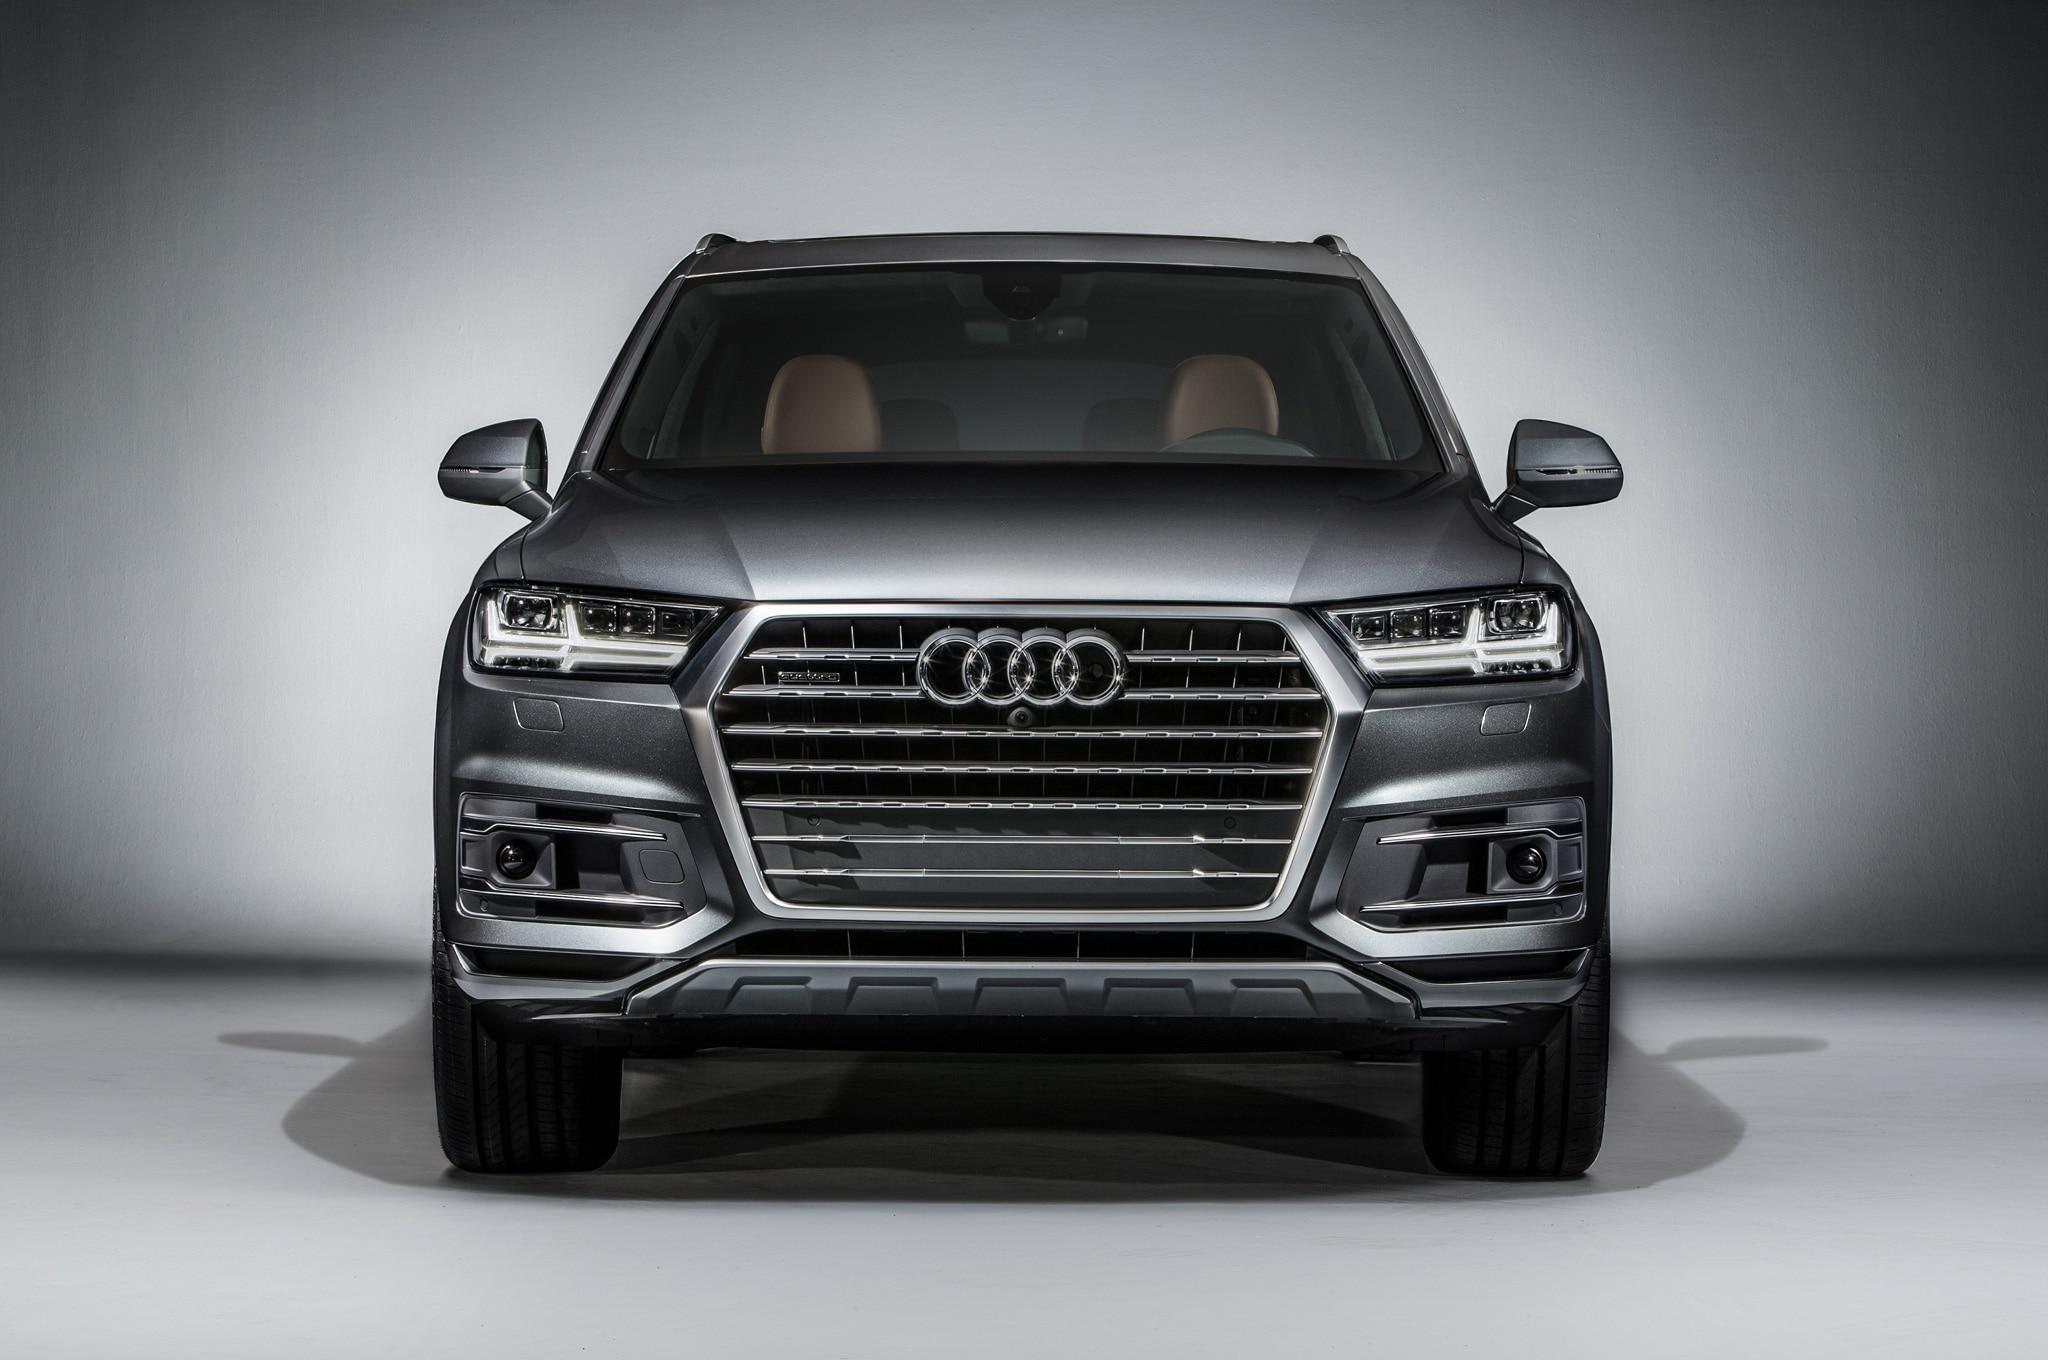 Audi Q7 Review  Research New amp Used Audi Q7 Models  Edmunds